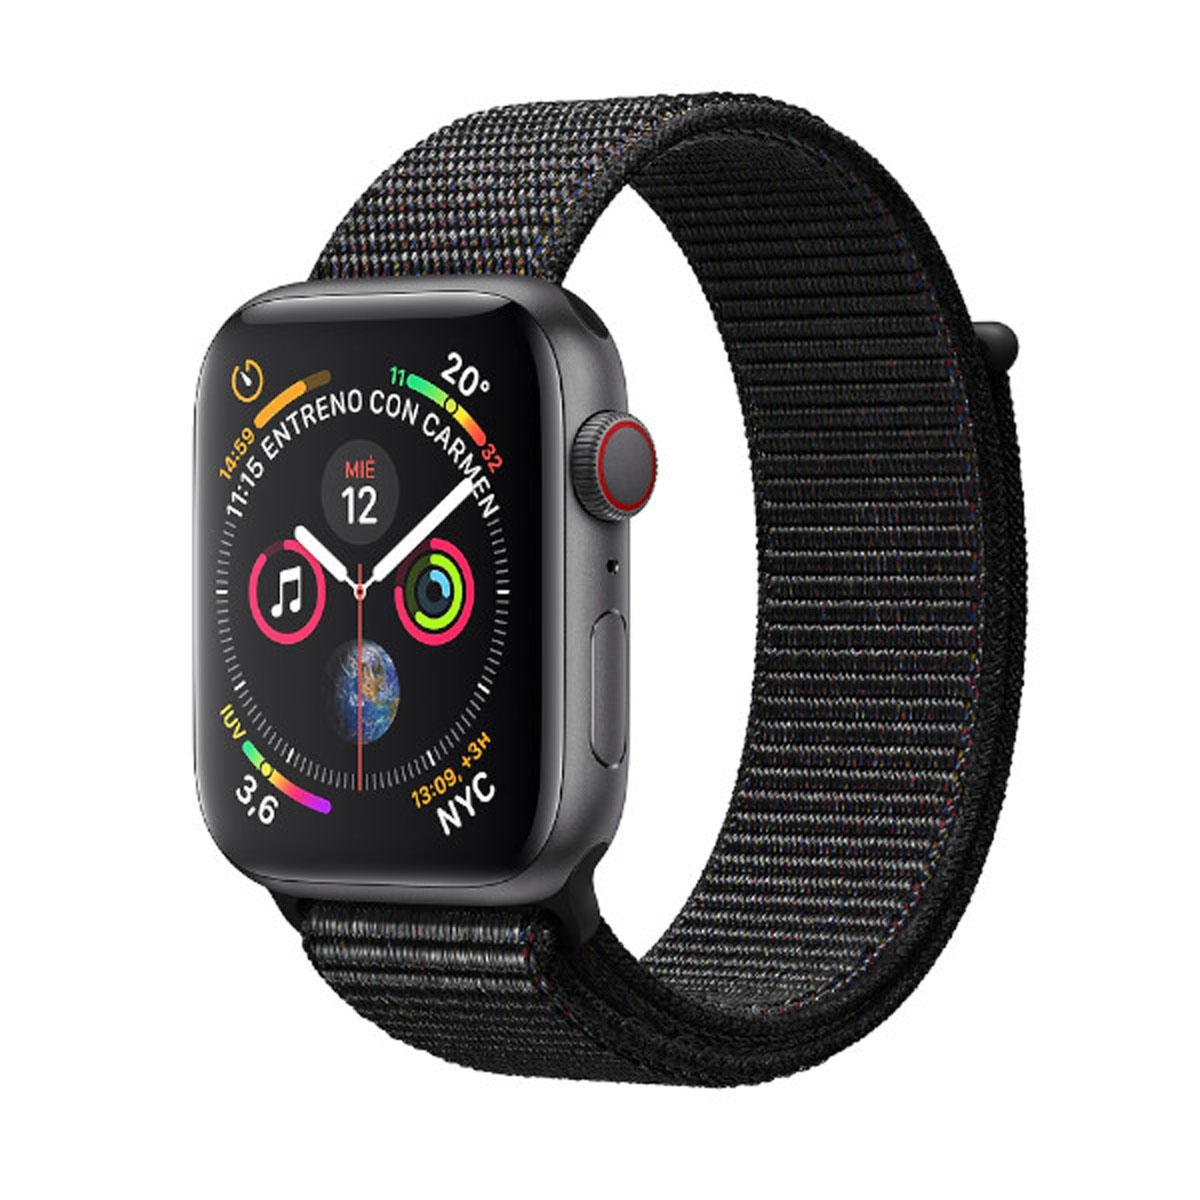 Apple watch series 4 gps+cellular 4